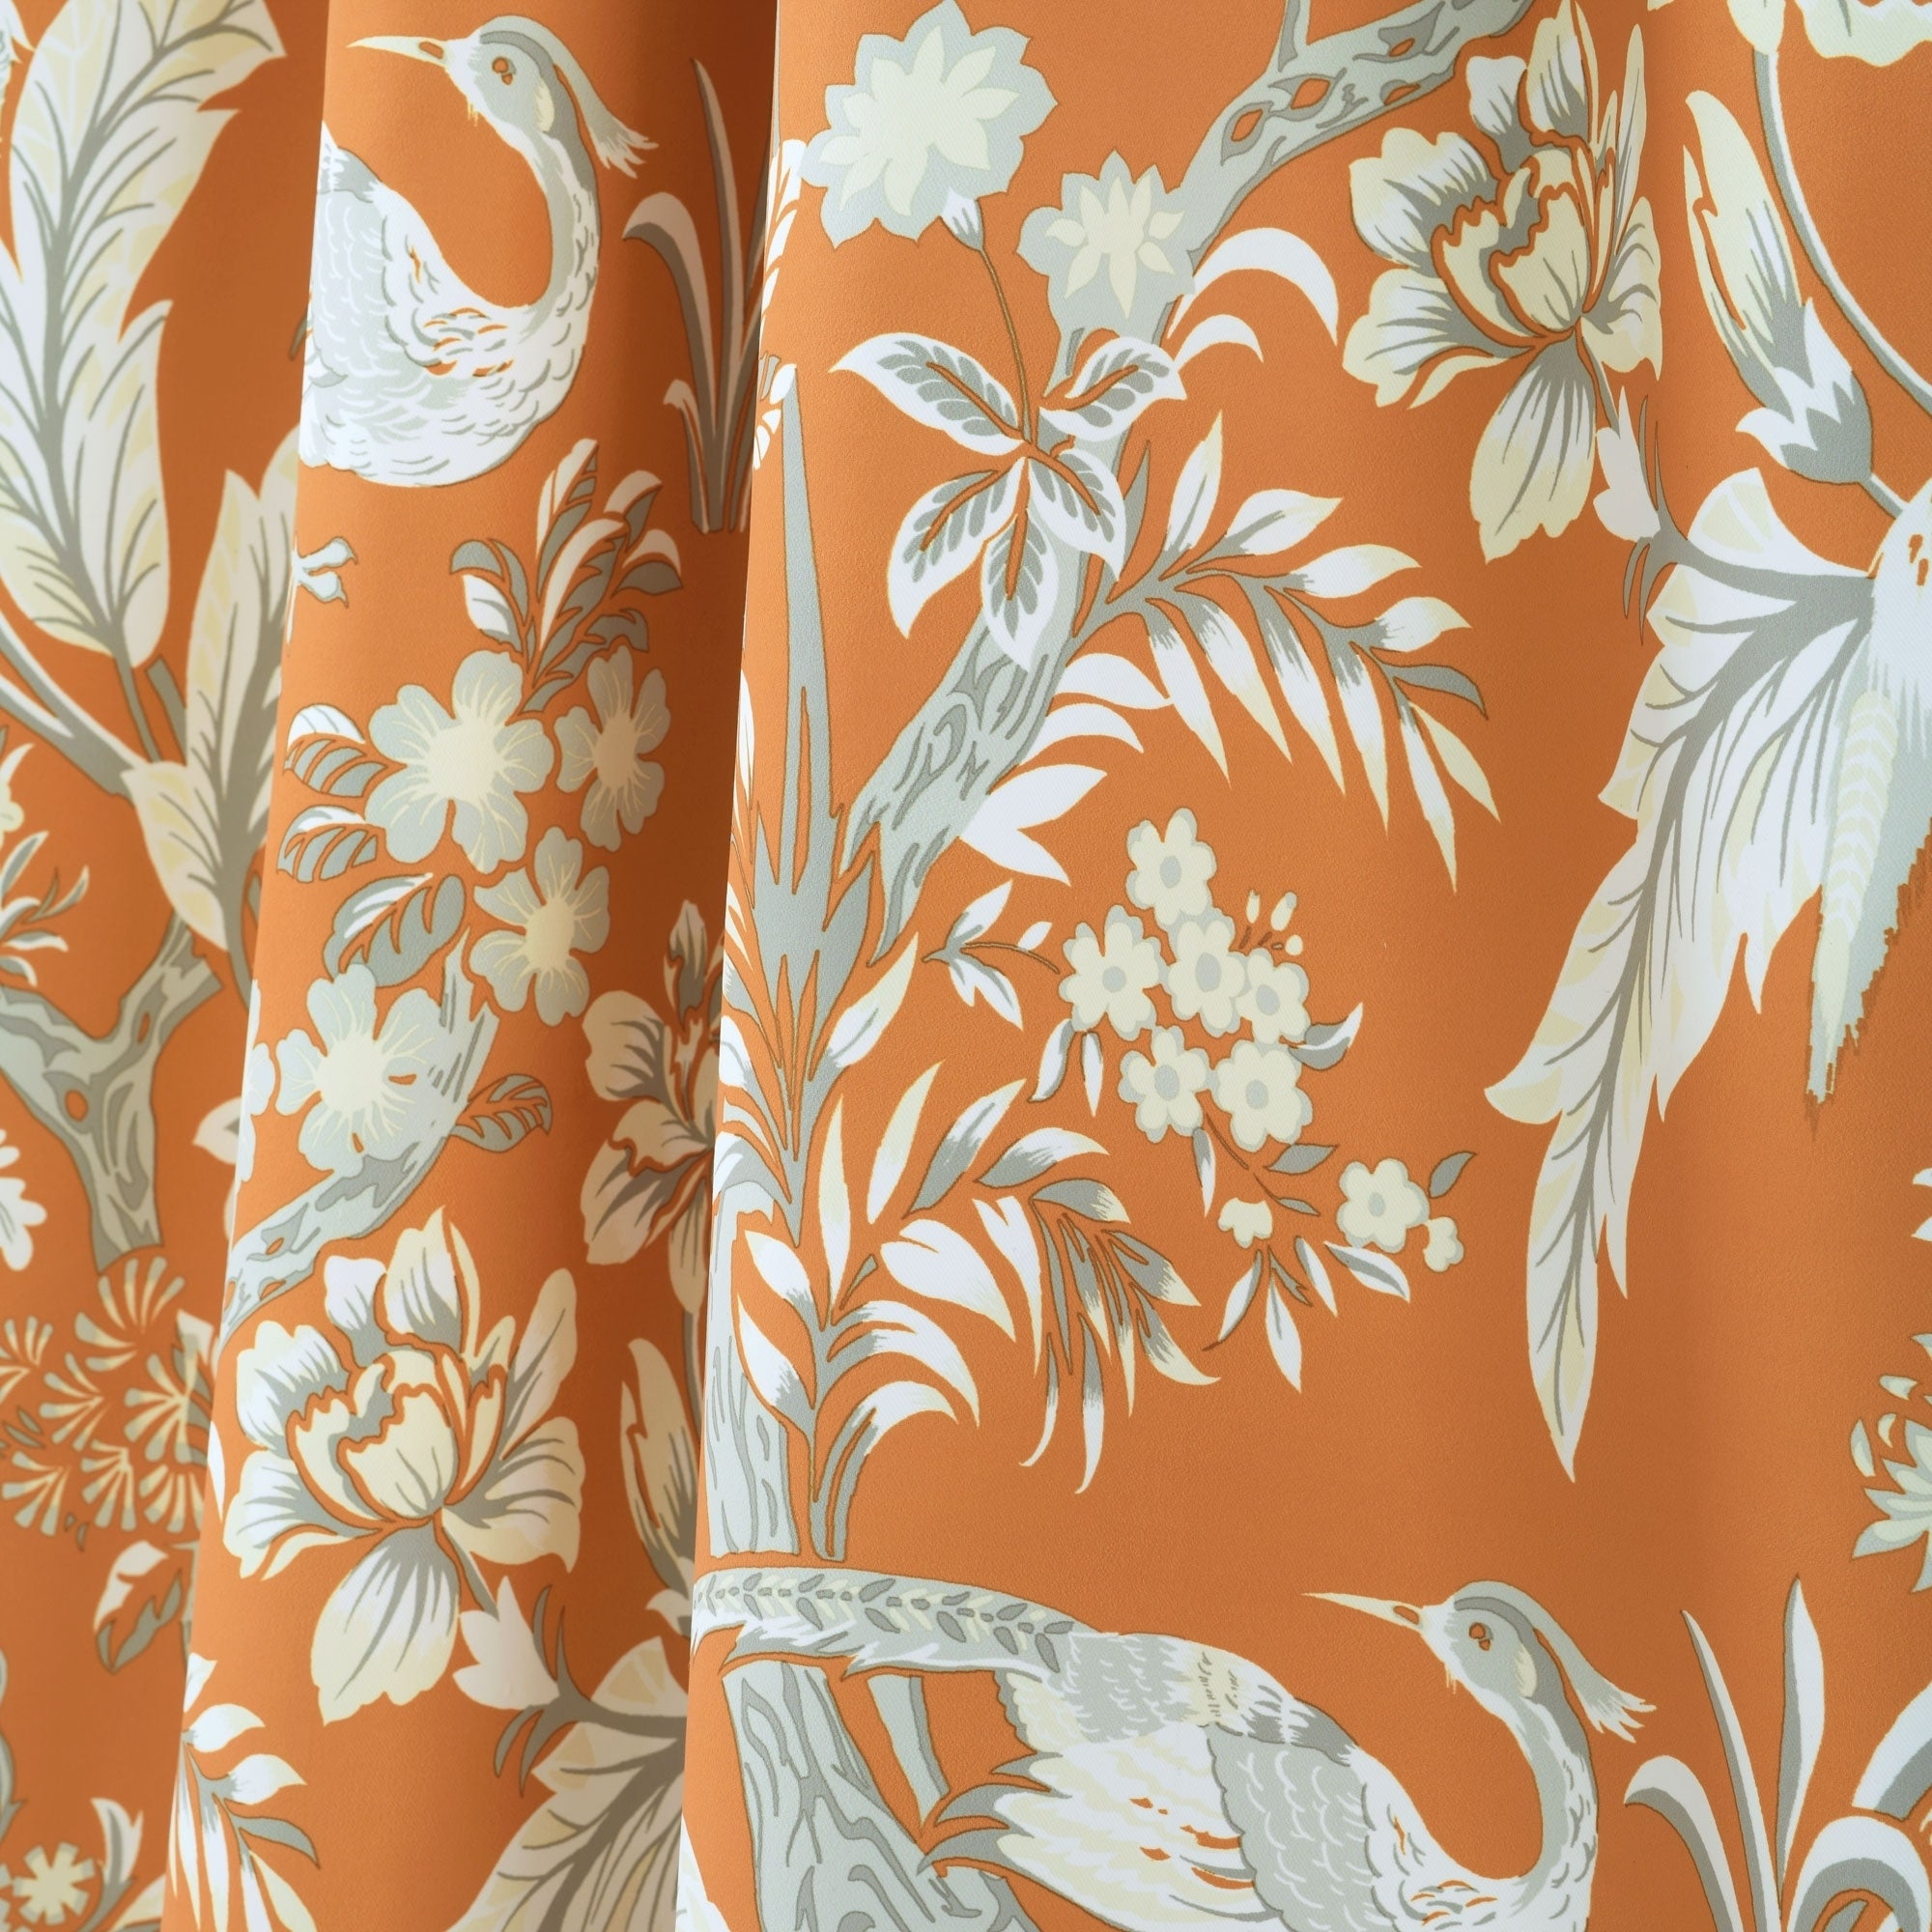 Lush Decor Dolores Room Darkening Floral Curtain Panel Pair Pertaining To Dolores Room Darkening Floral Curtain Panel Pairs (View 10 of 20)